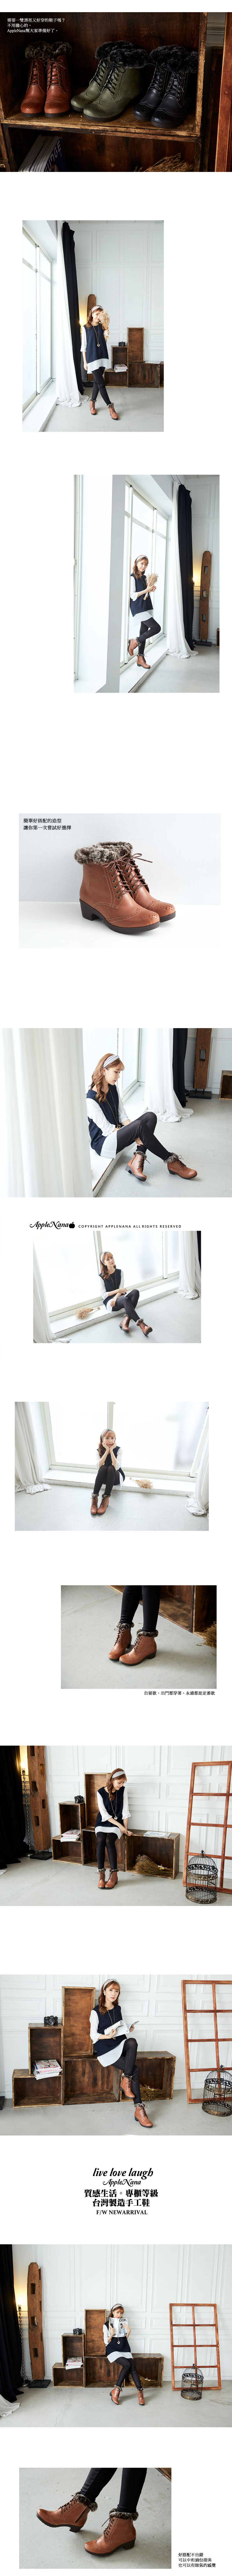 http://shop.r10s.com/5e7ca0c0-ec8c-11e4-ac44-005056b756e3/2016-09/T203-4.jpg